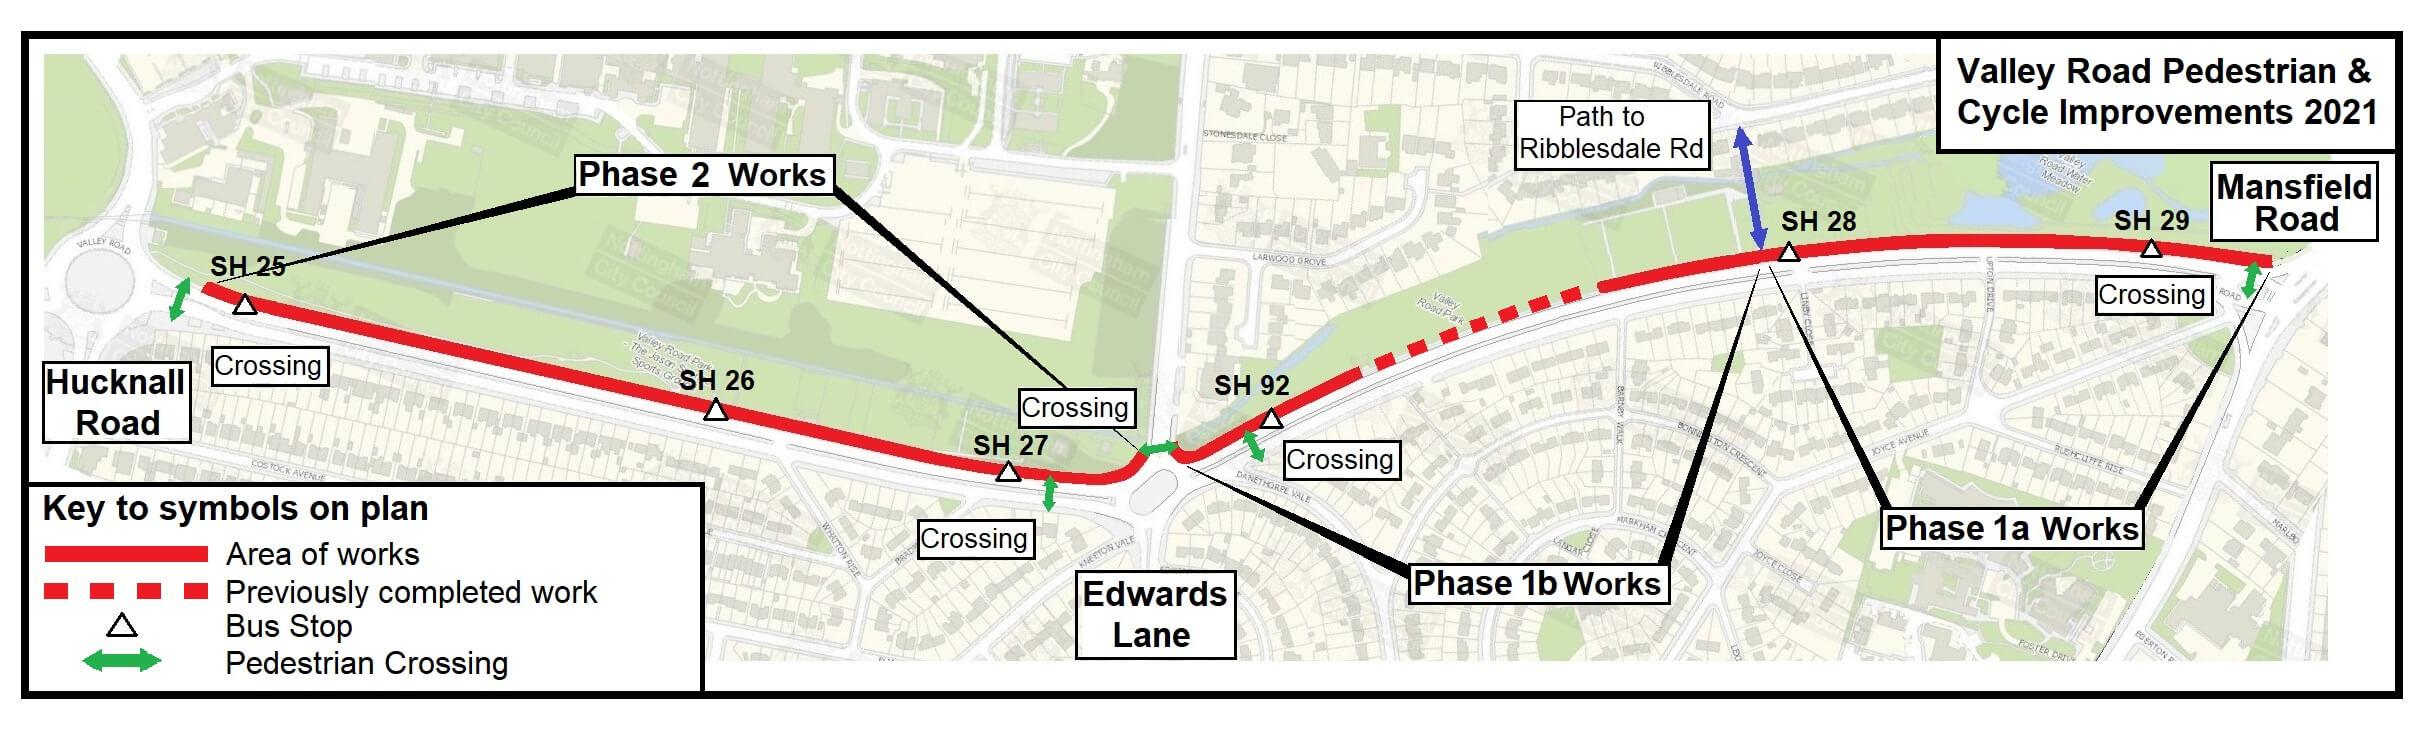 Valley Road plan